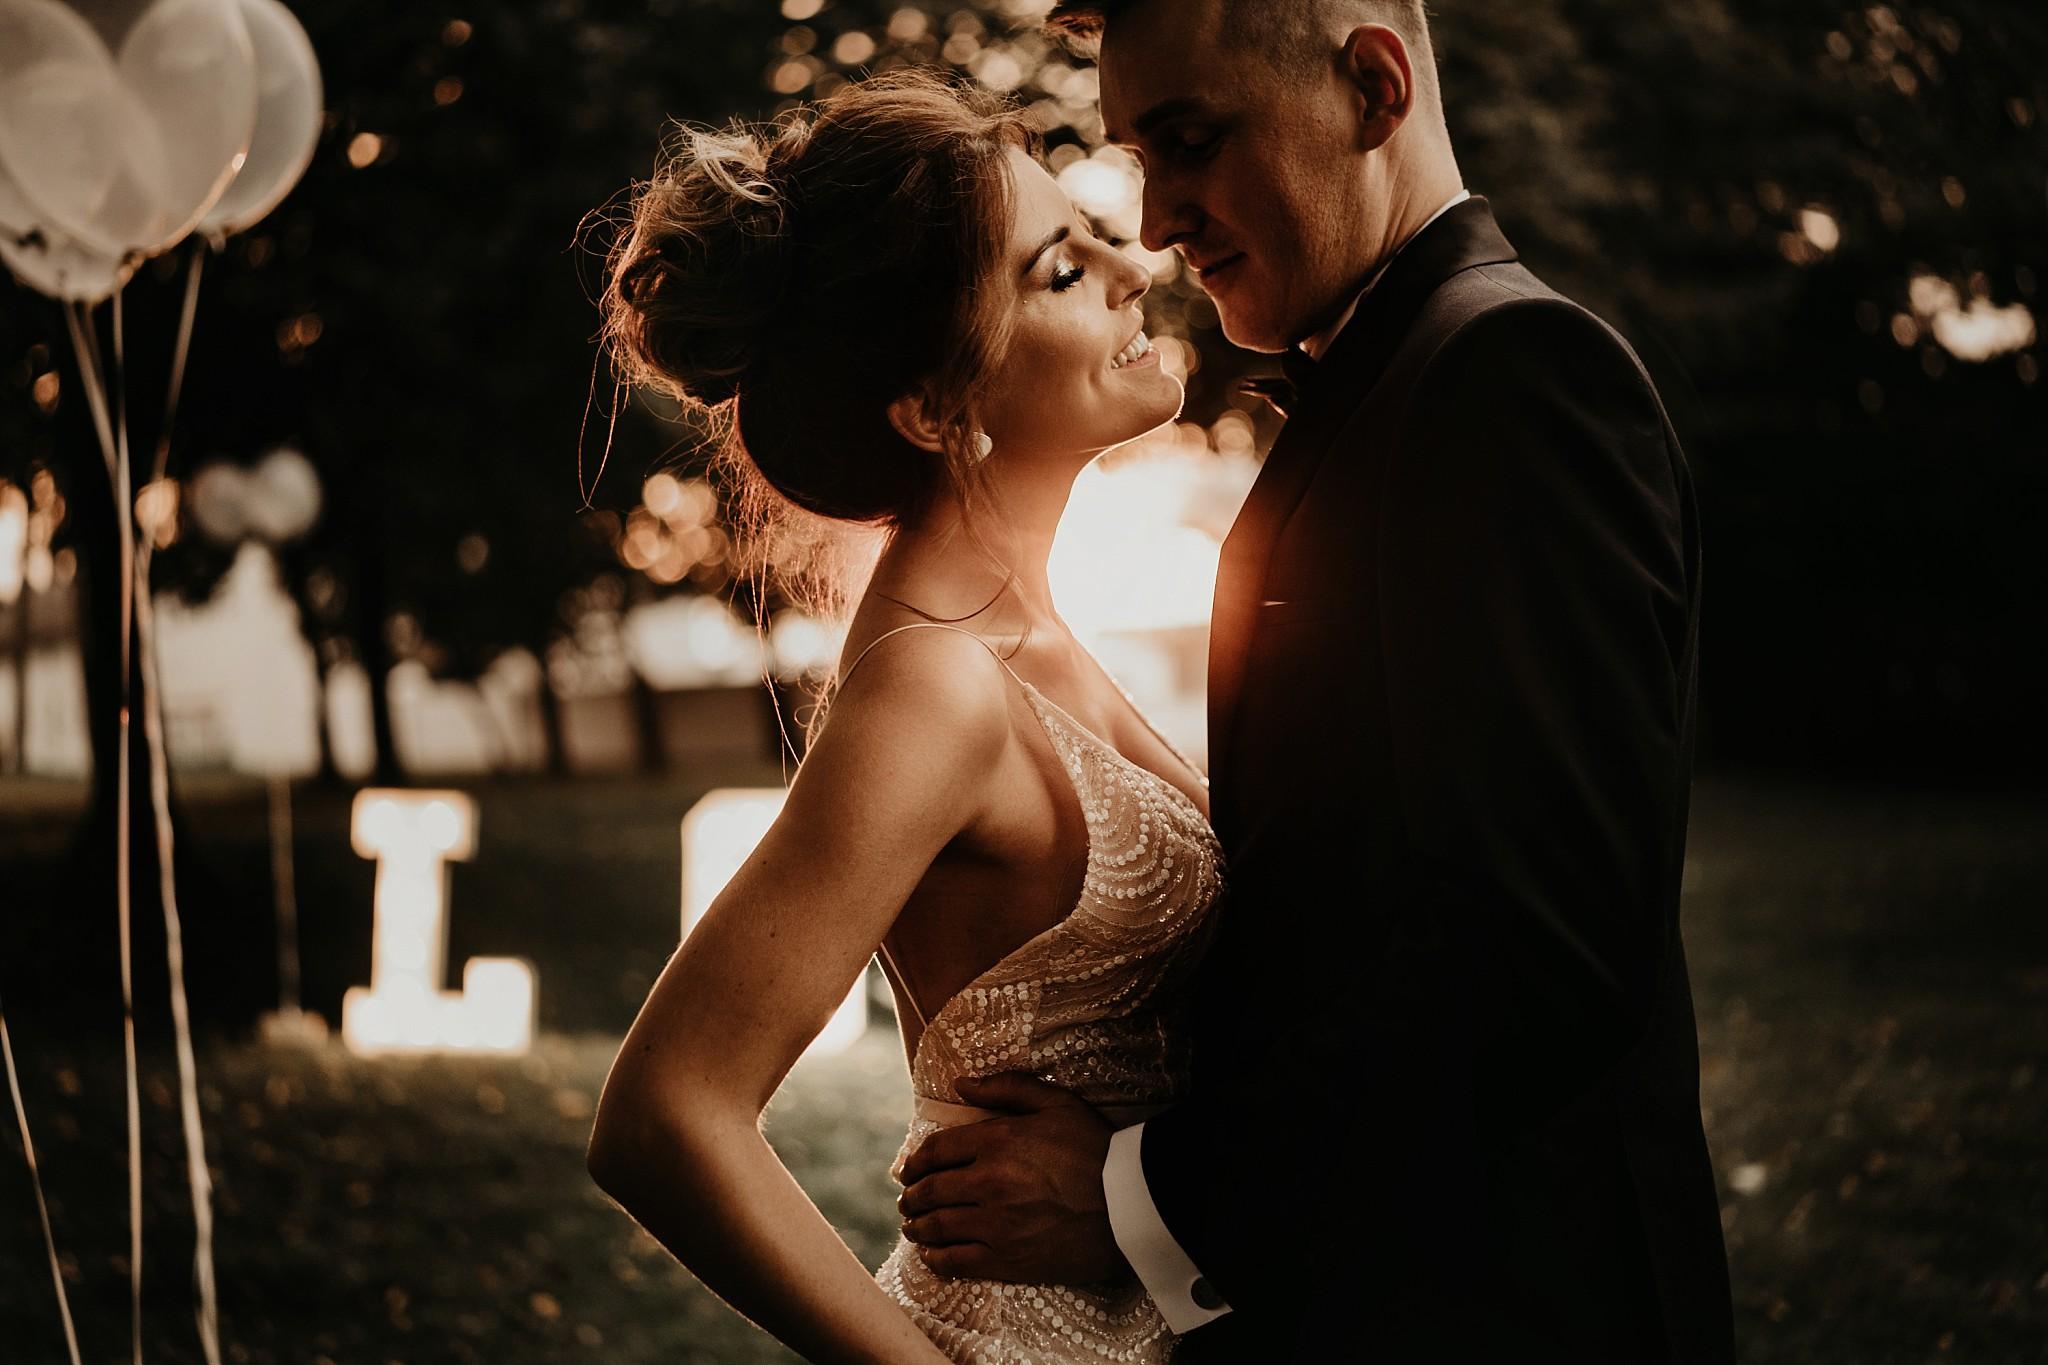 fotograf poznan wesele dobra truskawka piekne wesele pod poznaniem wesele w dobrej truskawce piekna para mloda slub marzen slub koronawirus slub listopad wesele koronawirus 375